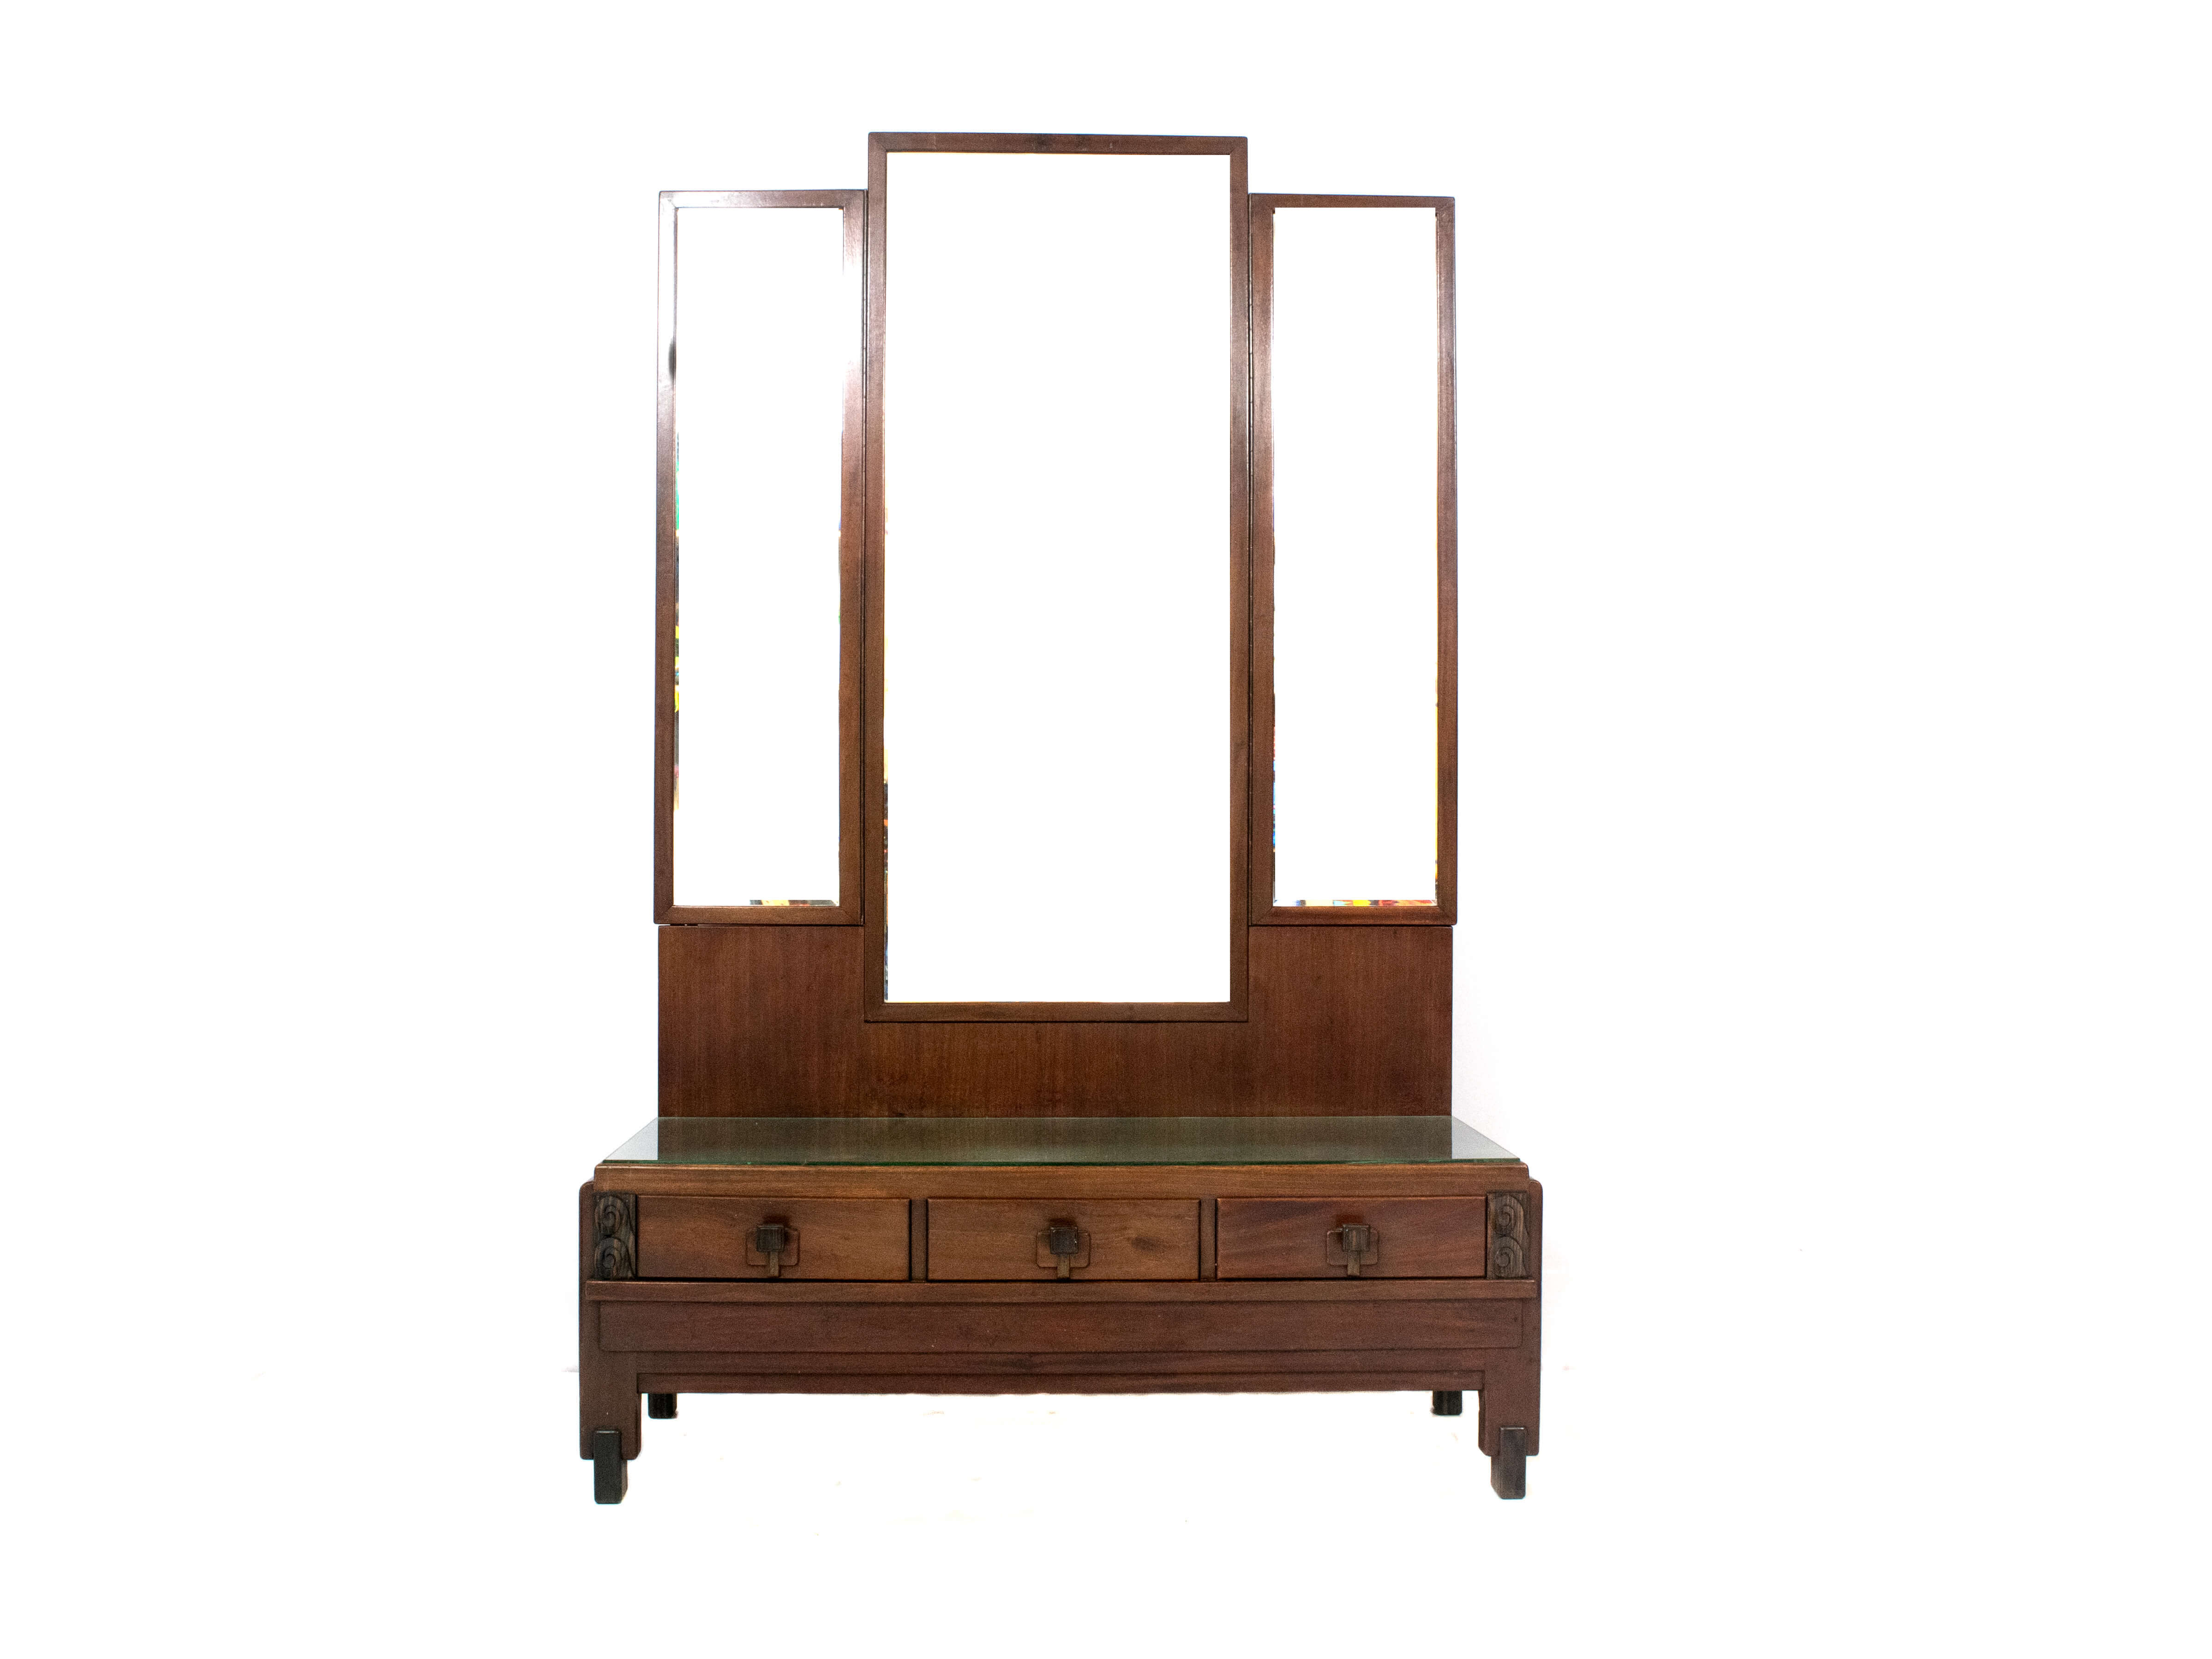 Amsterdam School Mahogany Dressing- Hall Cabinet with Three Mirrors, ±1920s